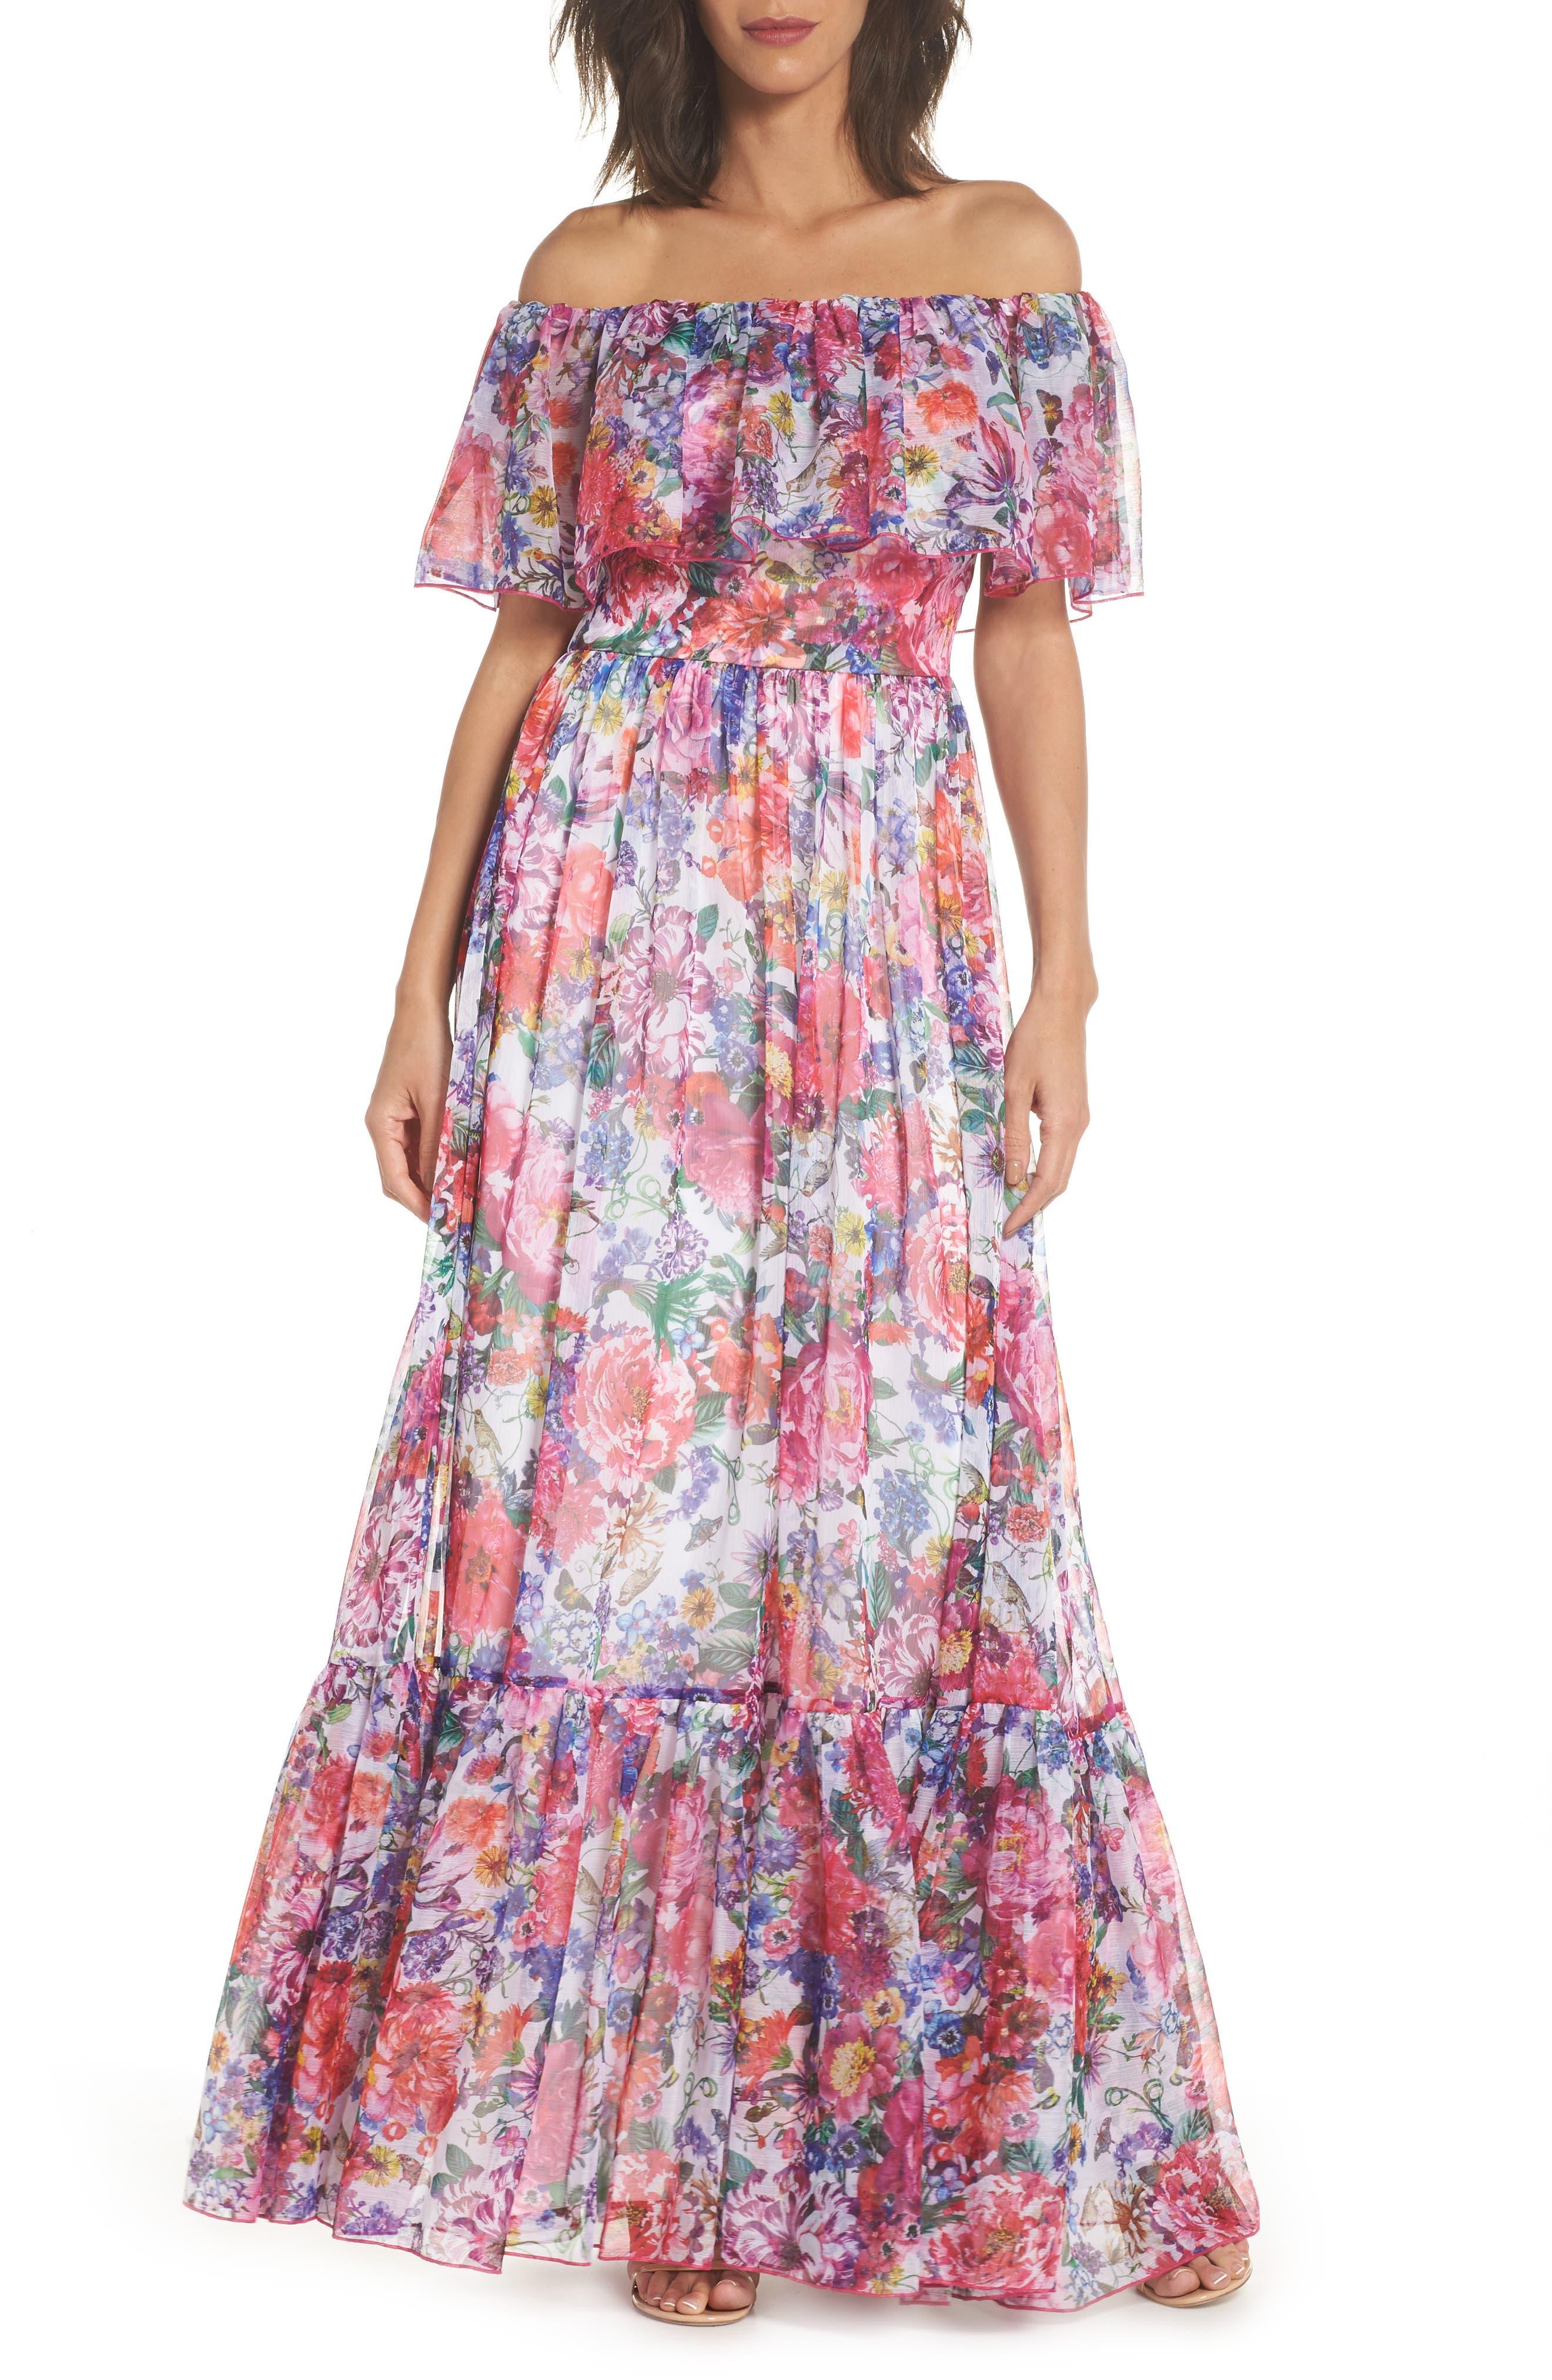 Tadashi Shoji Paola Floral Off the Shoulder Gown